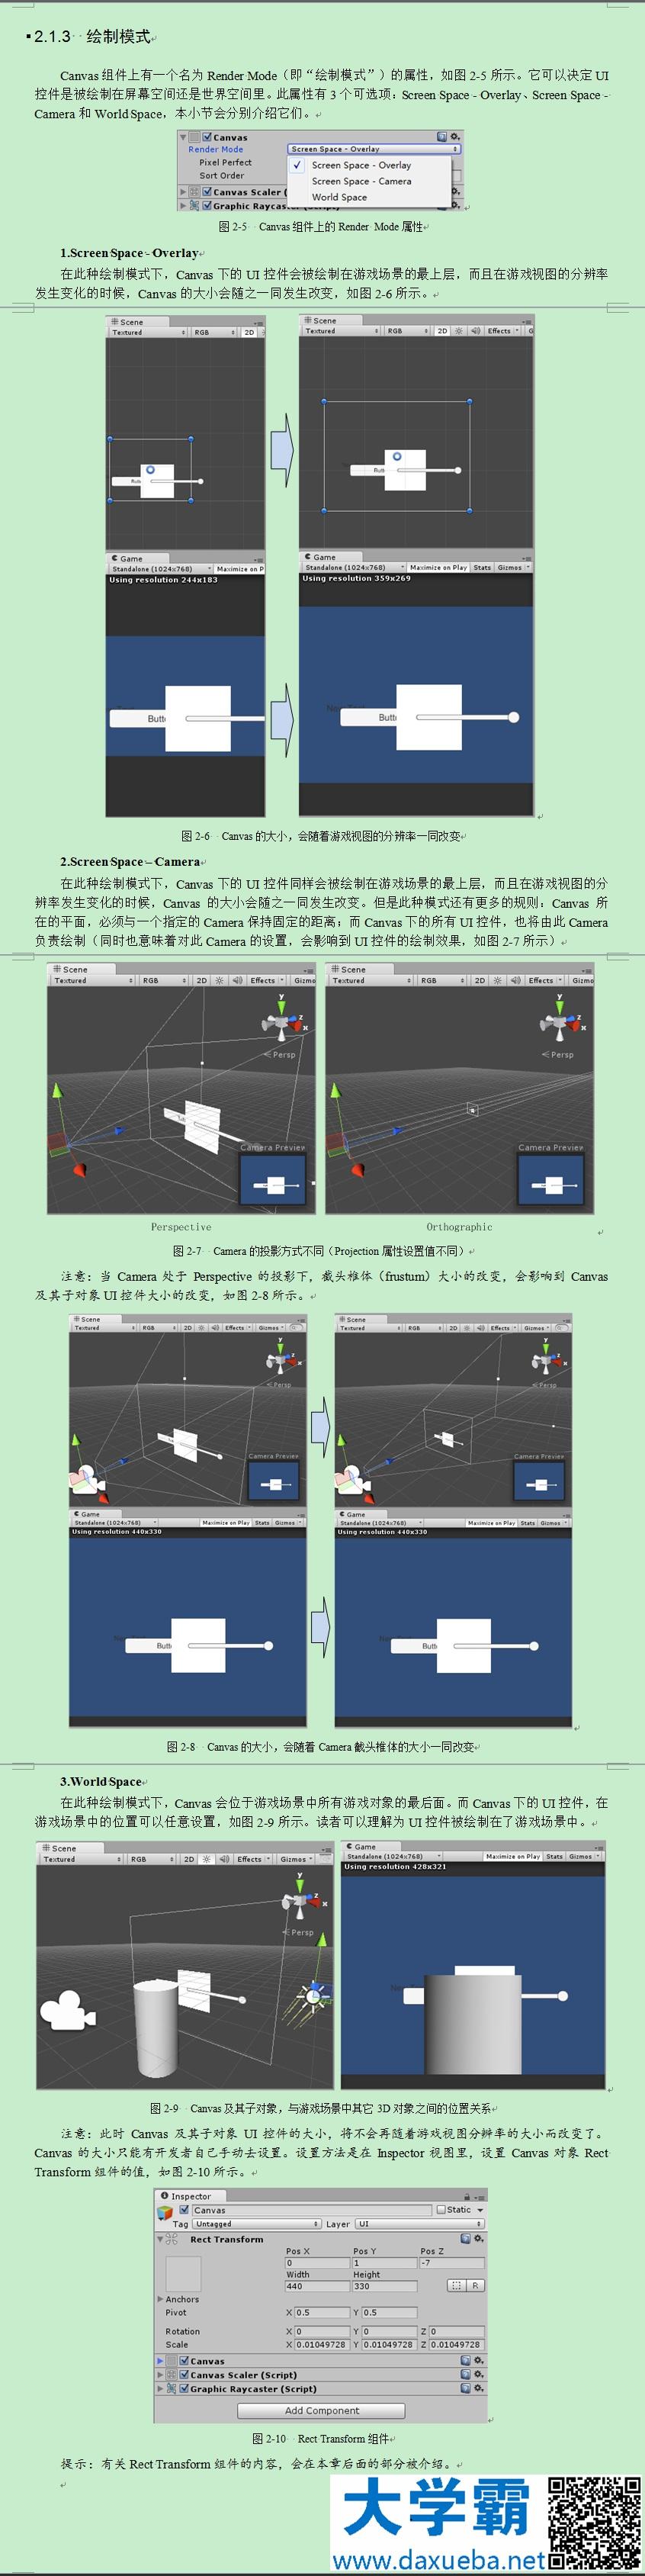 Unity UGUI——Canvas绘制模式比较_Unity3d_积木网(gimoo net)